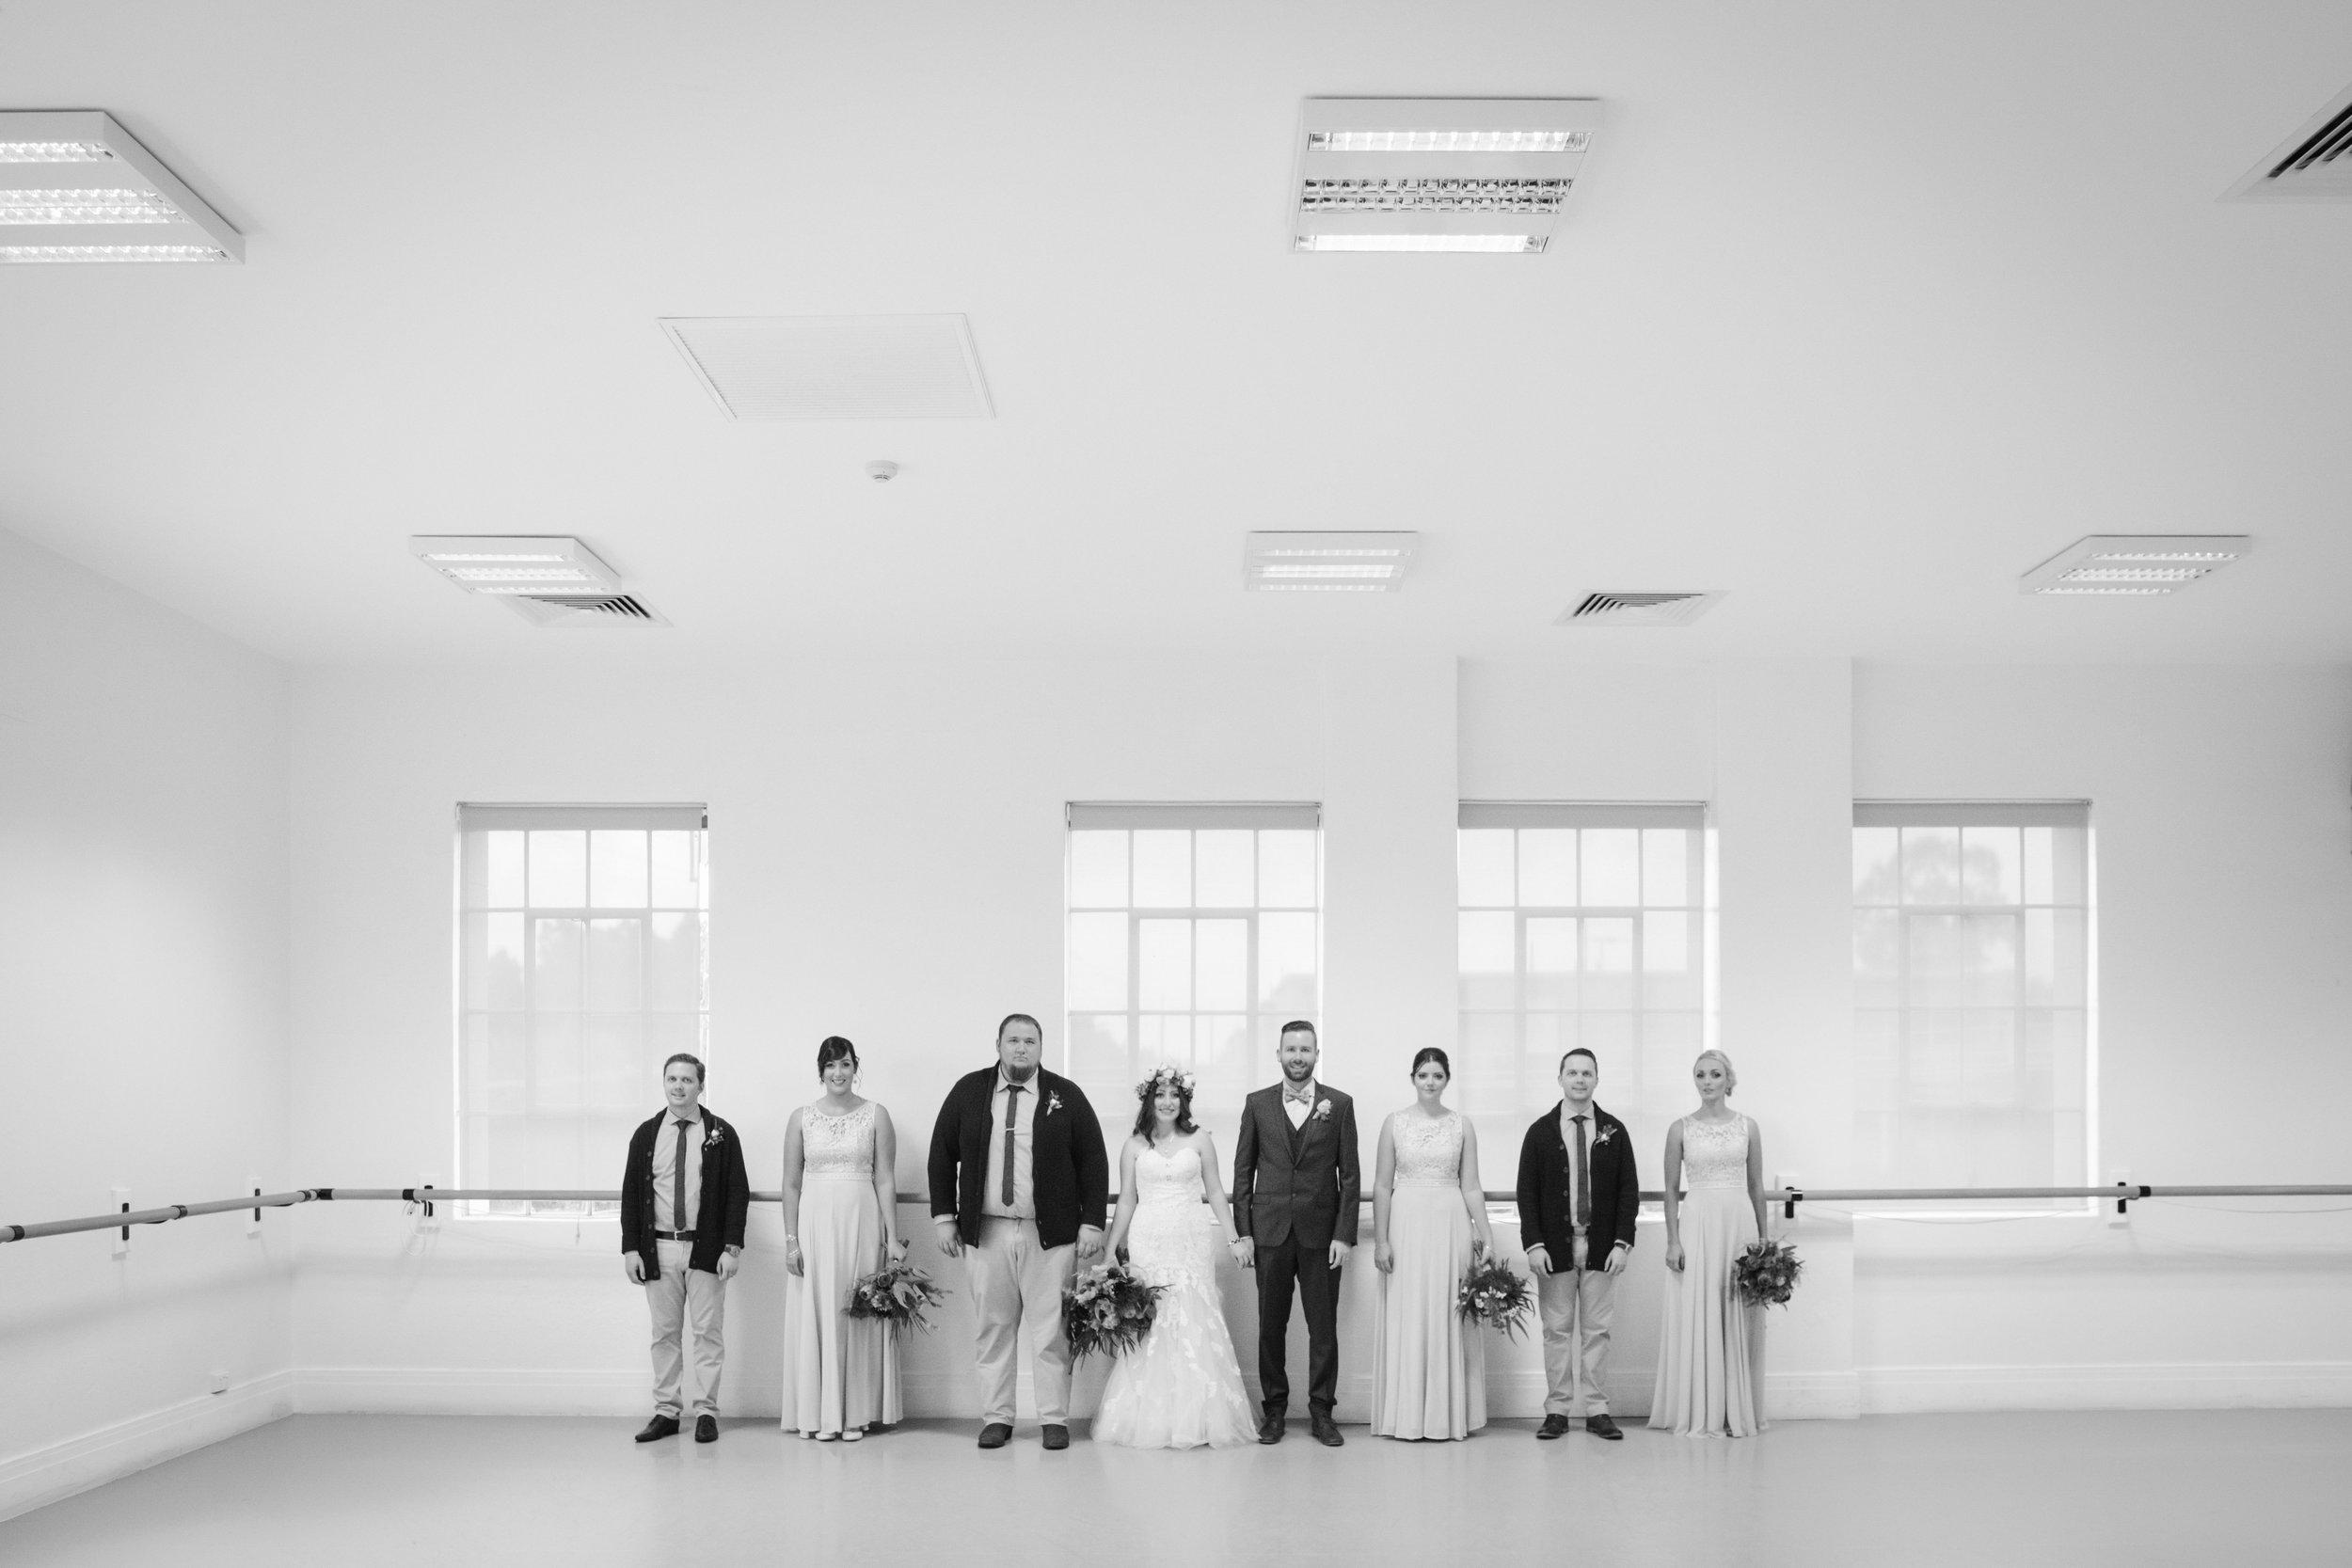 WA Ballet Centre Swan Valley Oakover Grounds Perth Wheatbelt Avon Valley Wedding Photographer (44).jpg